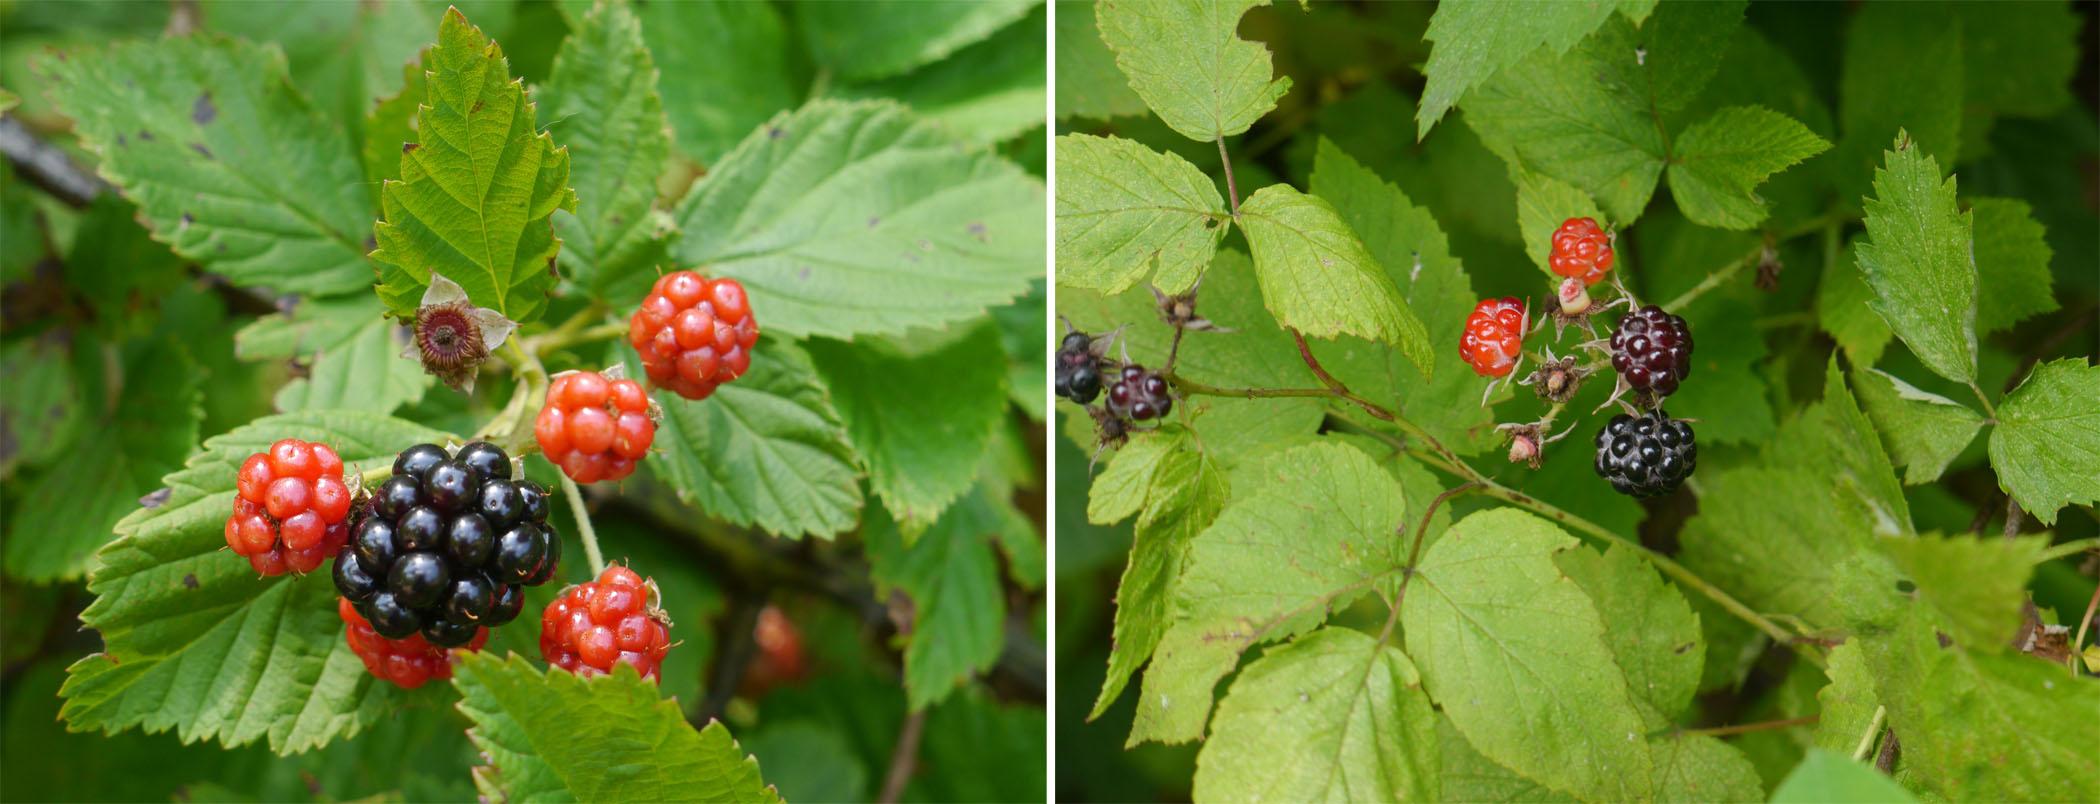 Blackberry-black raspberry